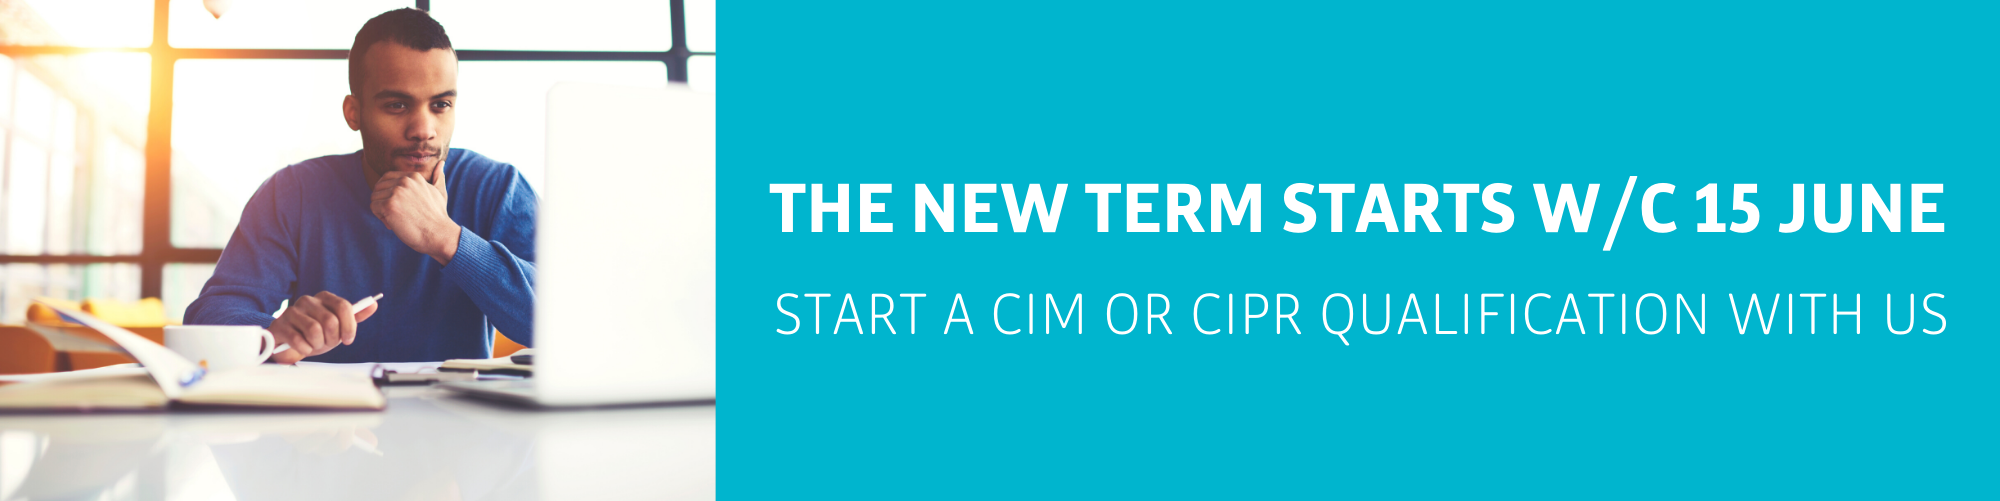 New Term Starts 15 June